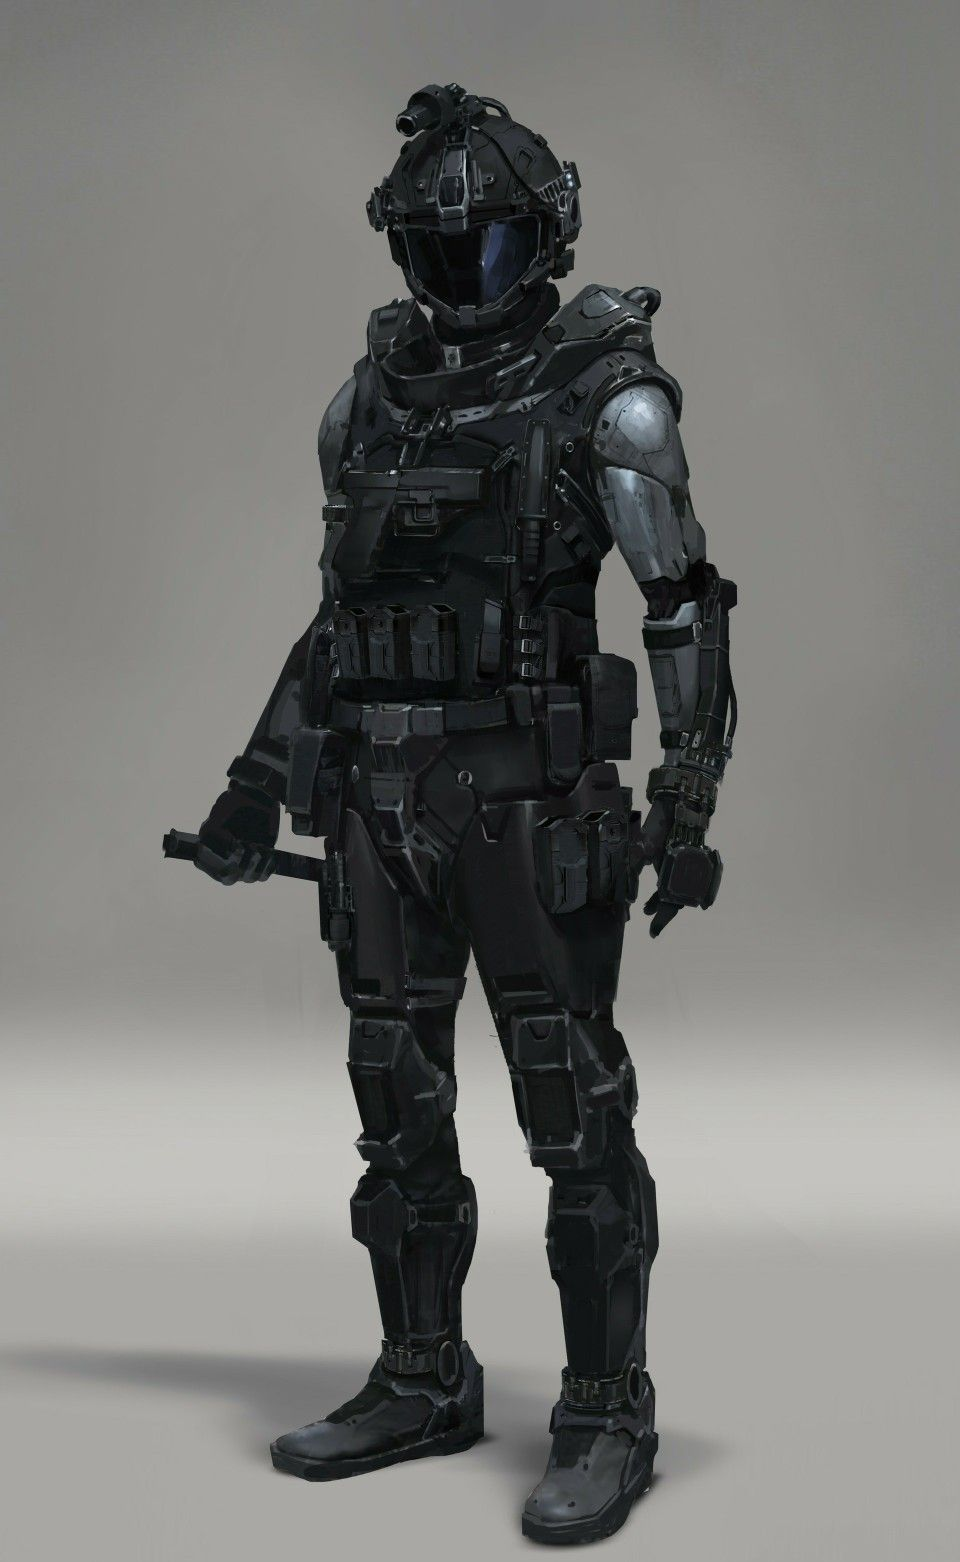 Futuristic military sol r concept art character desi…